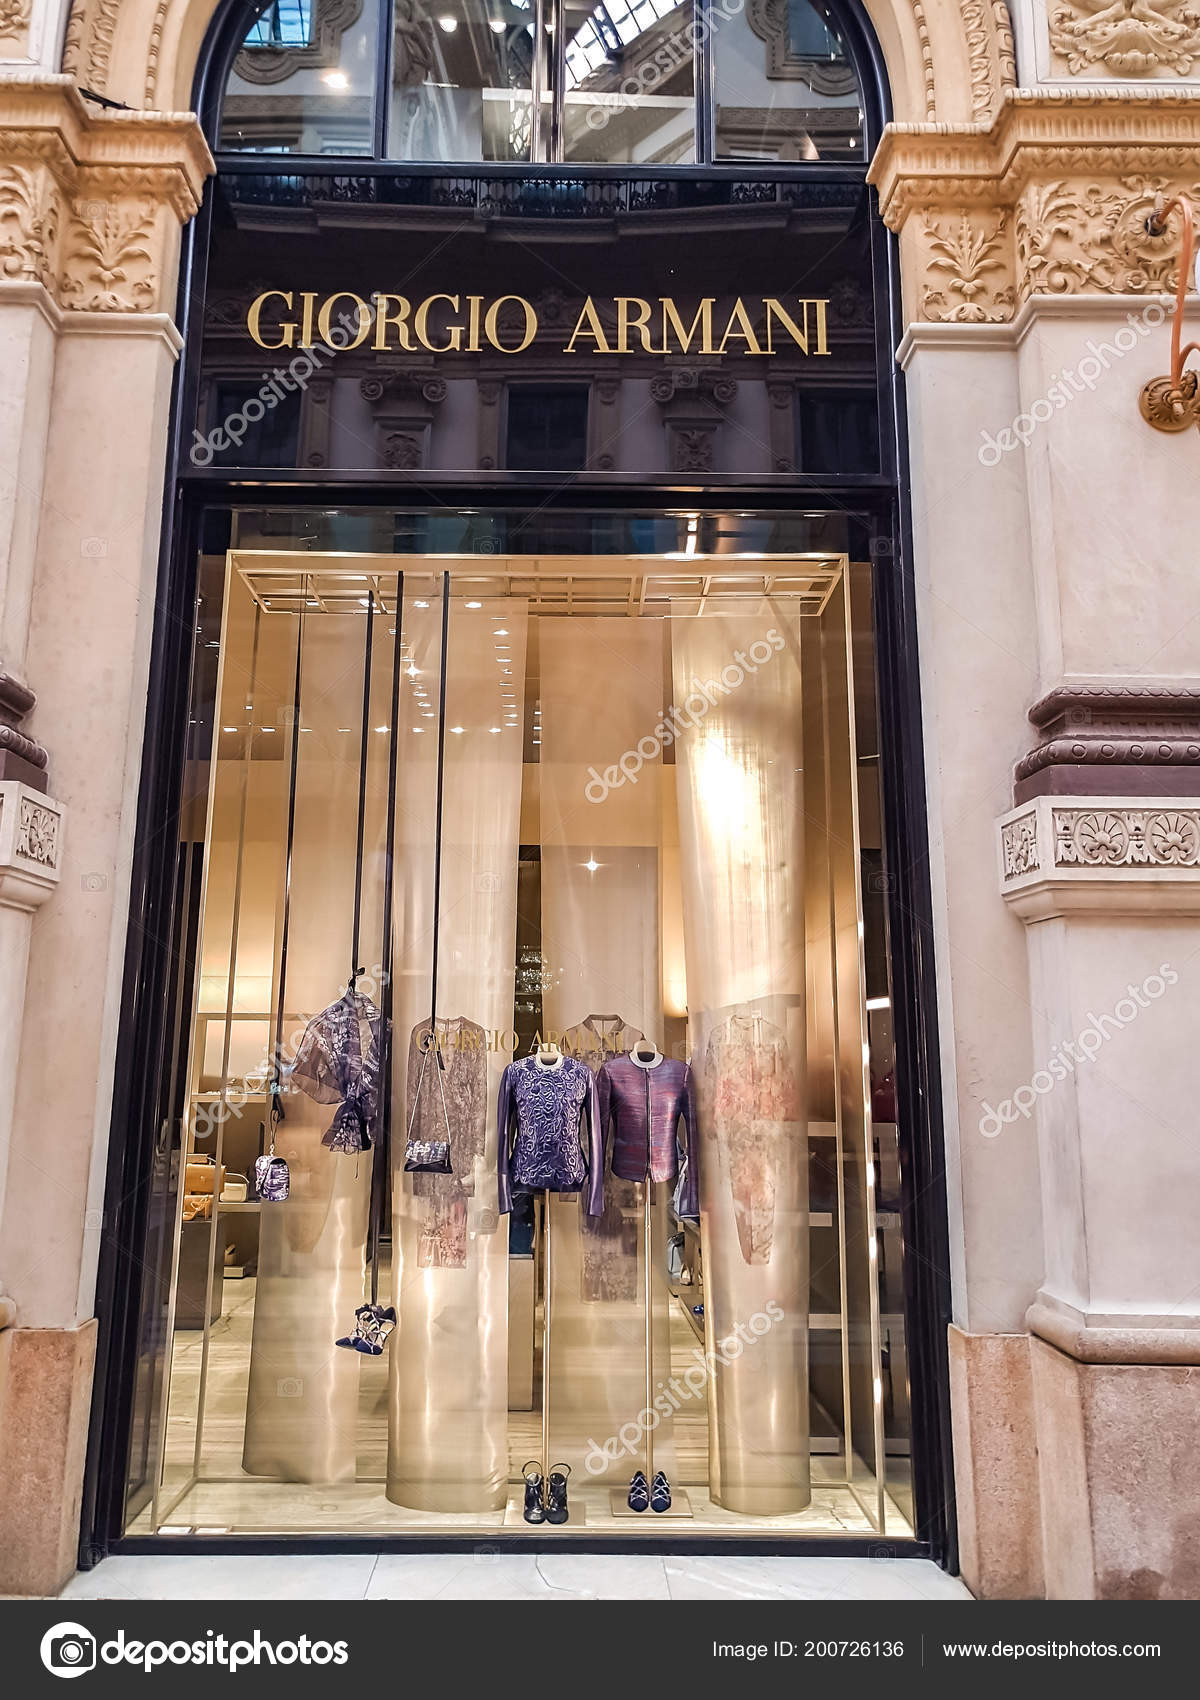 406c48d92 Milan Italie Avril 2017 Magasin Détail Armani Milan Italie Giorgio ...